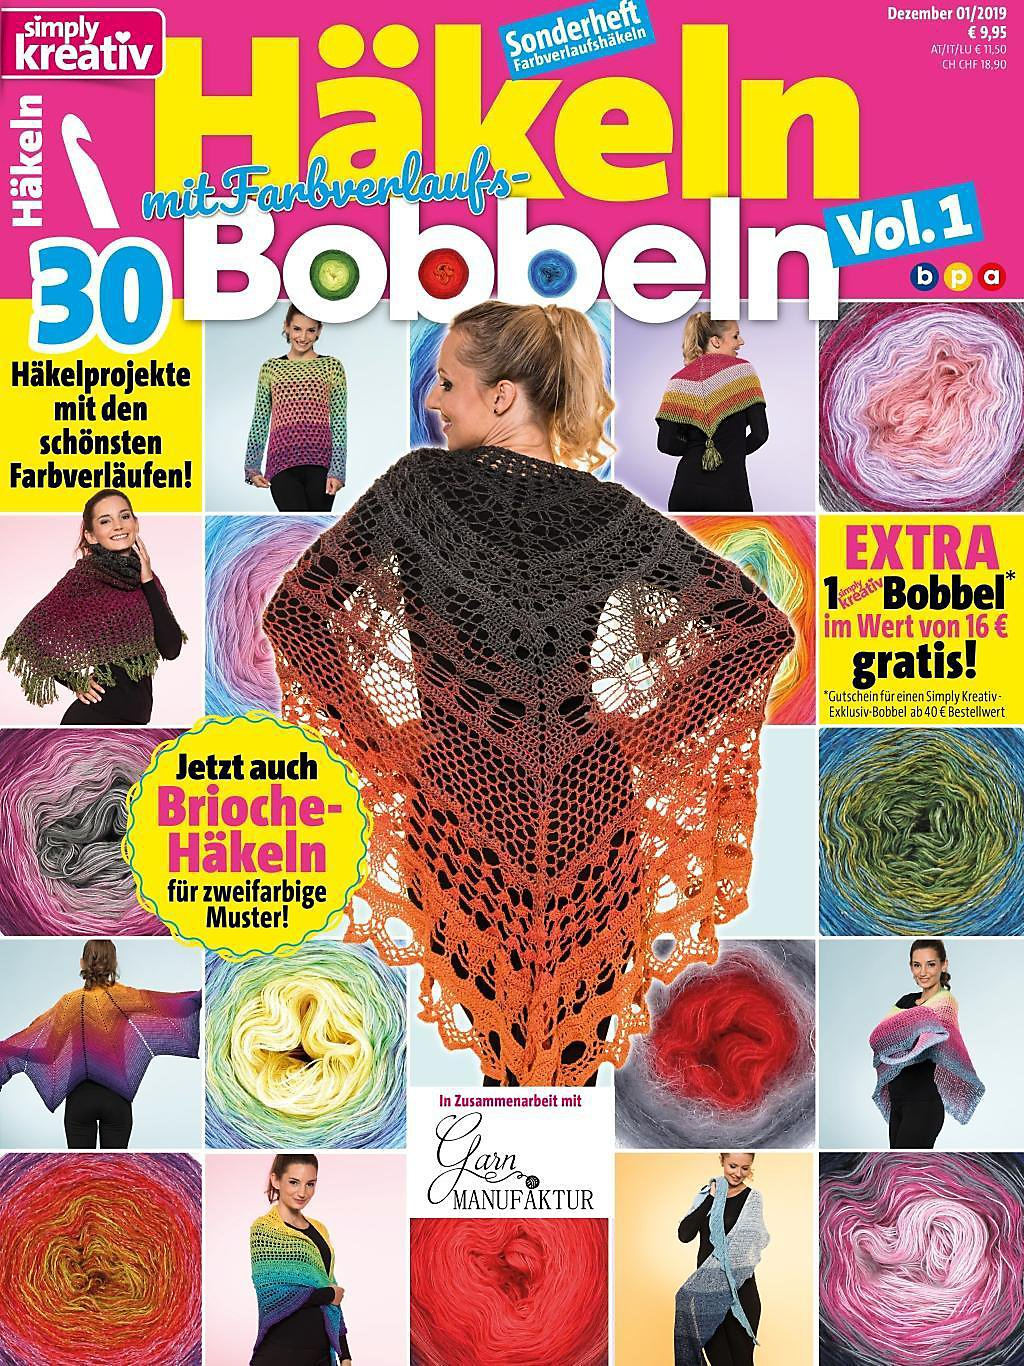 Simply Kreativ Häkeln Mit Farbverlaufs Bobbeln Buch Weltbildde